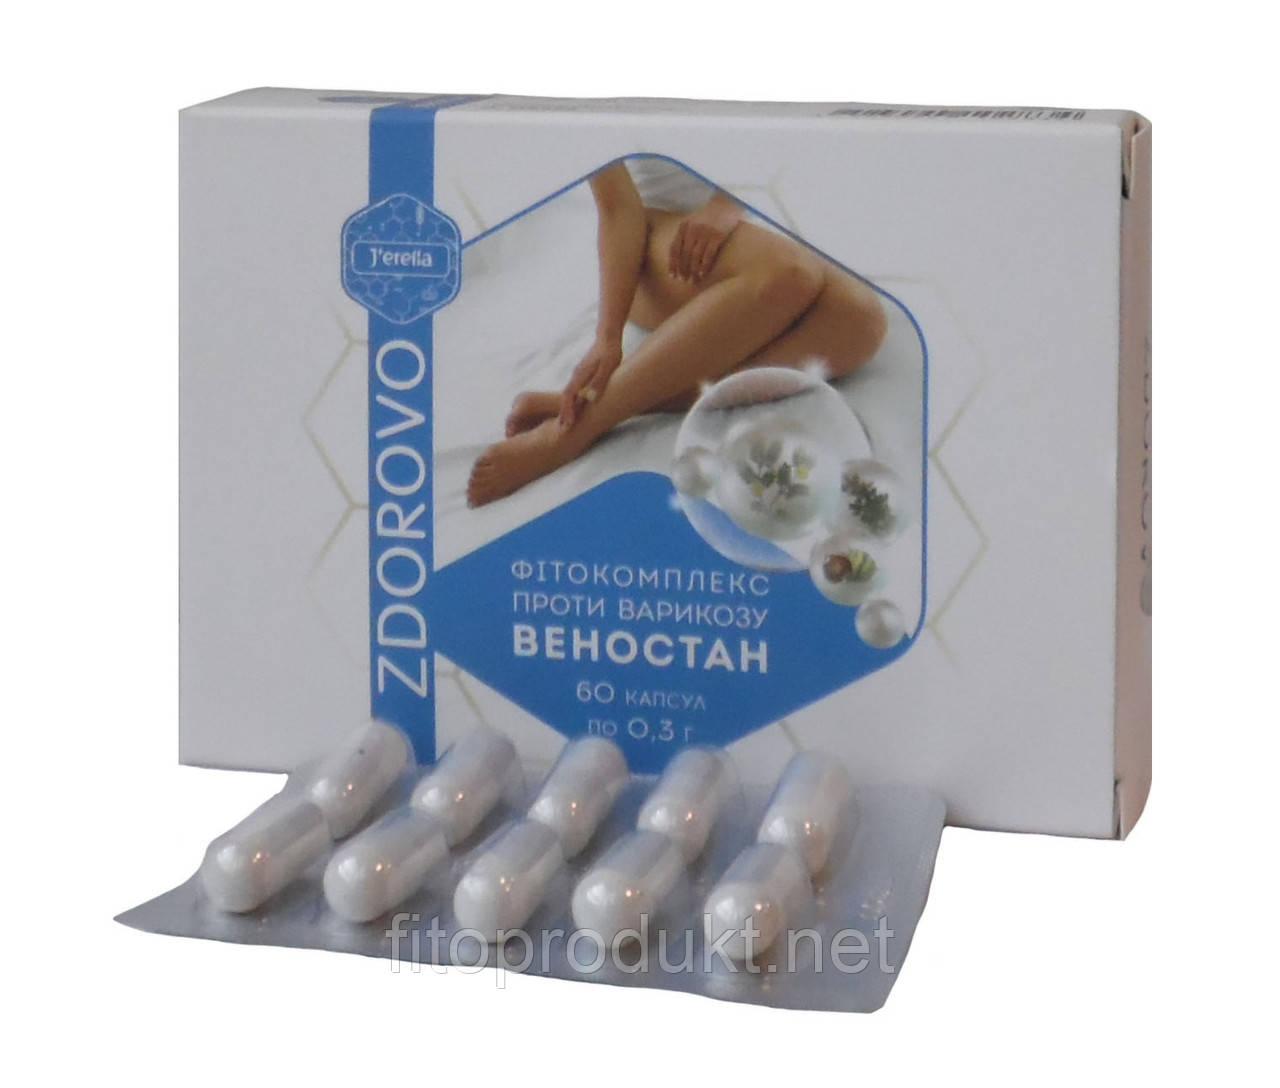 Веностан фитокомплекс против варикоза 60 капсул ZDOROVO